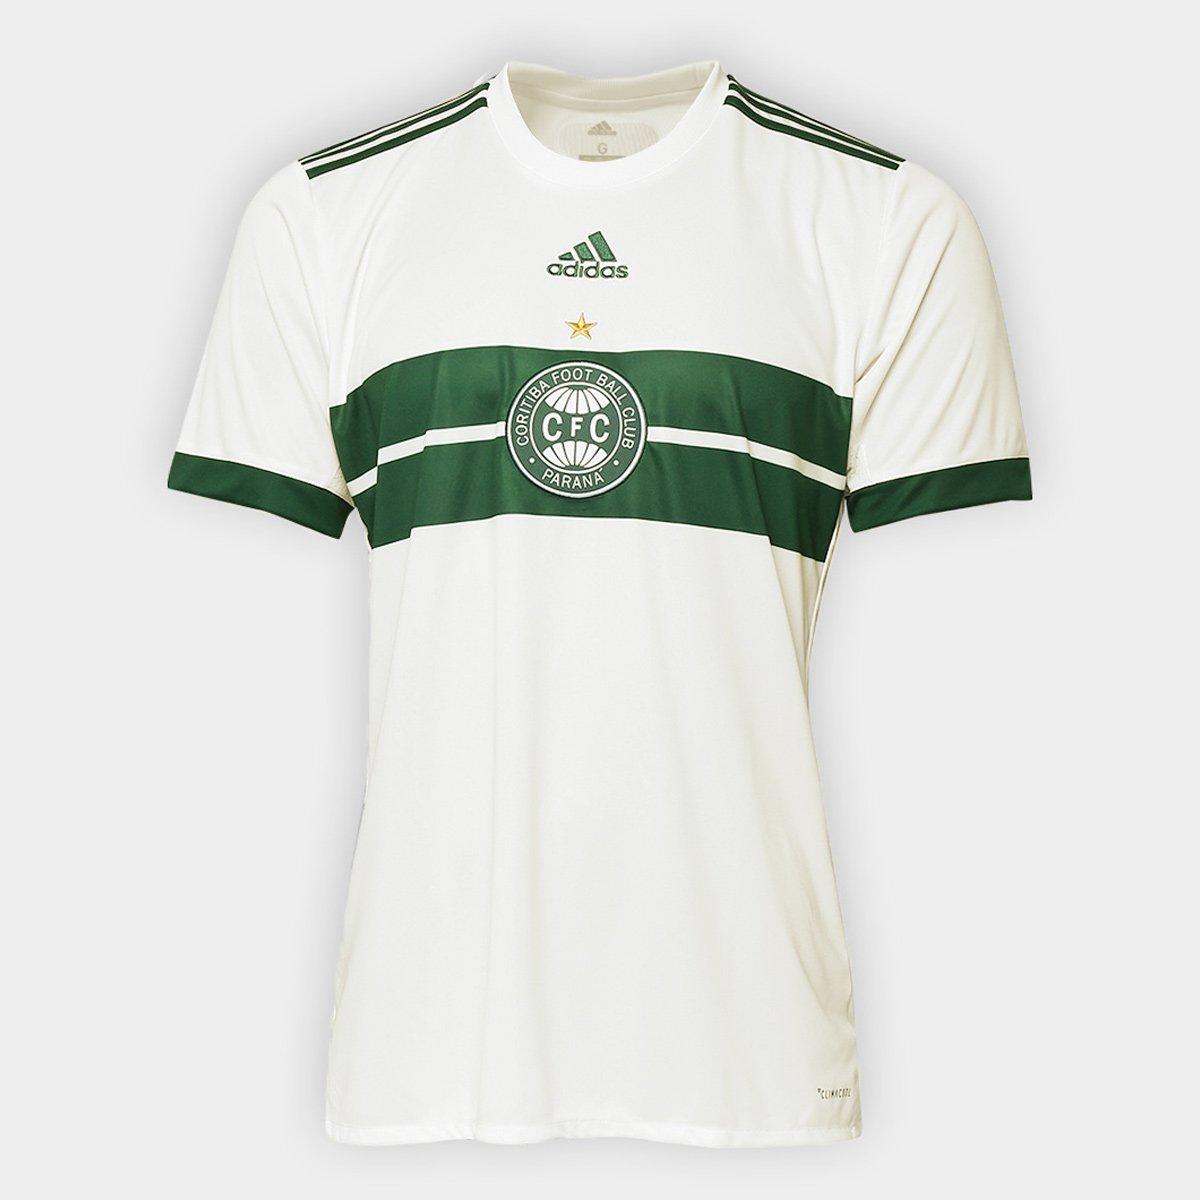 Camisa Coritiba I 17 18 s n° - Torcedor Adidas Masculina - Compre Agora  96abea94776c4